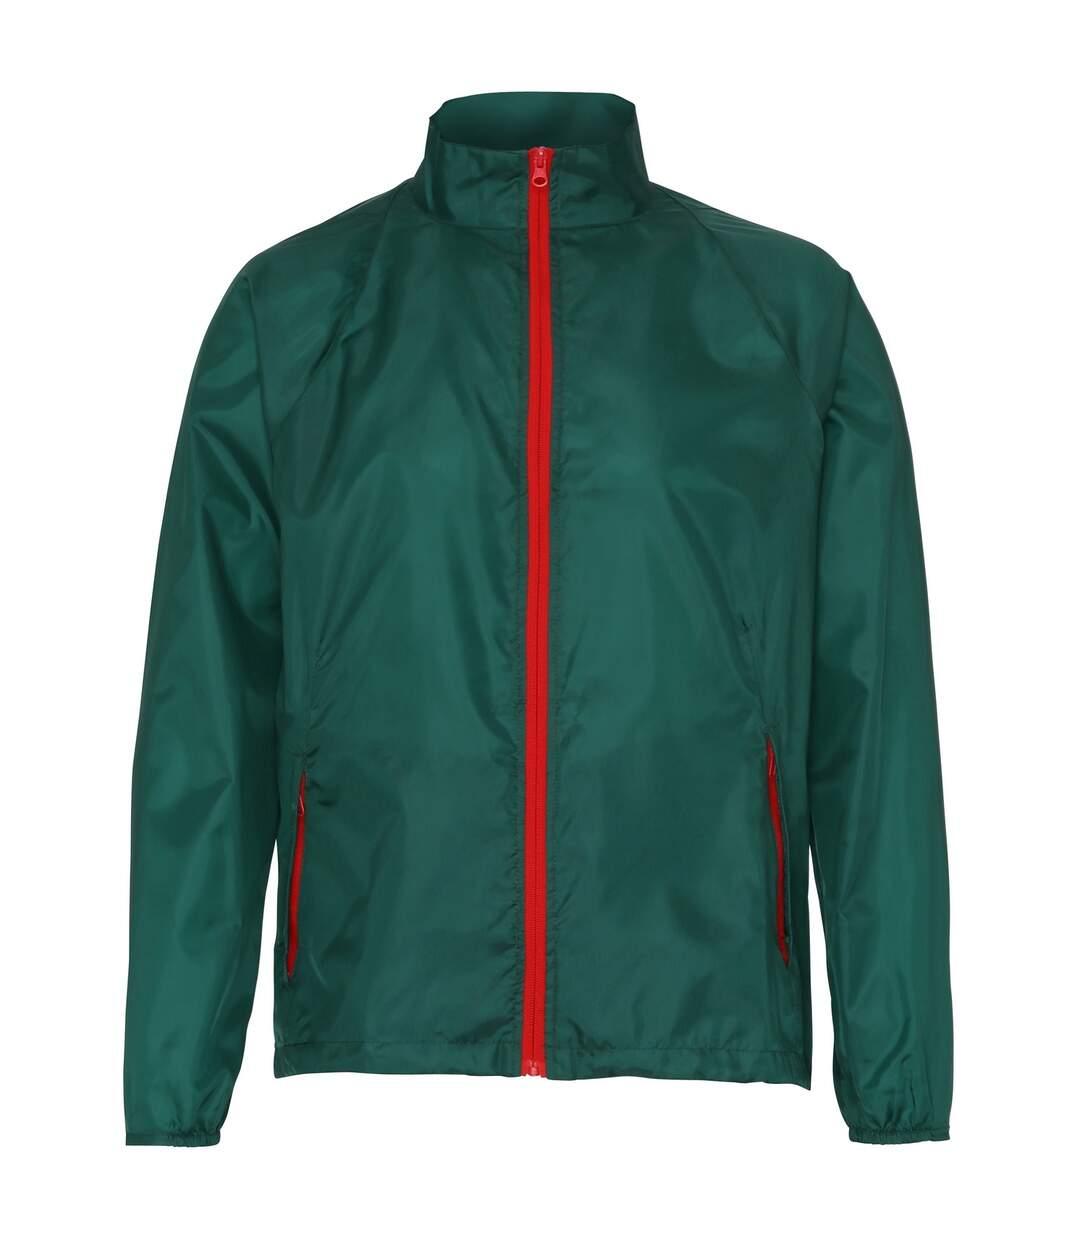 2786 Mens Contrast Lightweight Windcheater Shower Proof Jacket (Silver (Metallic)/ White) - UTRW2501